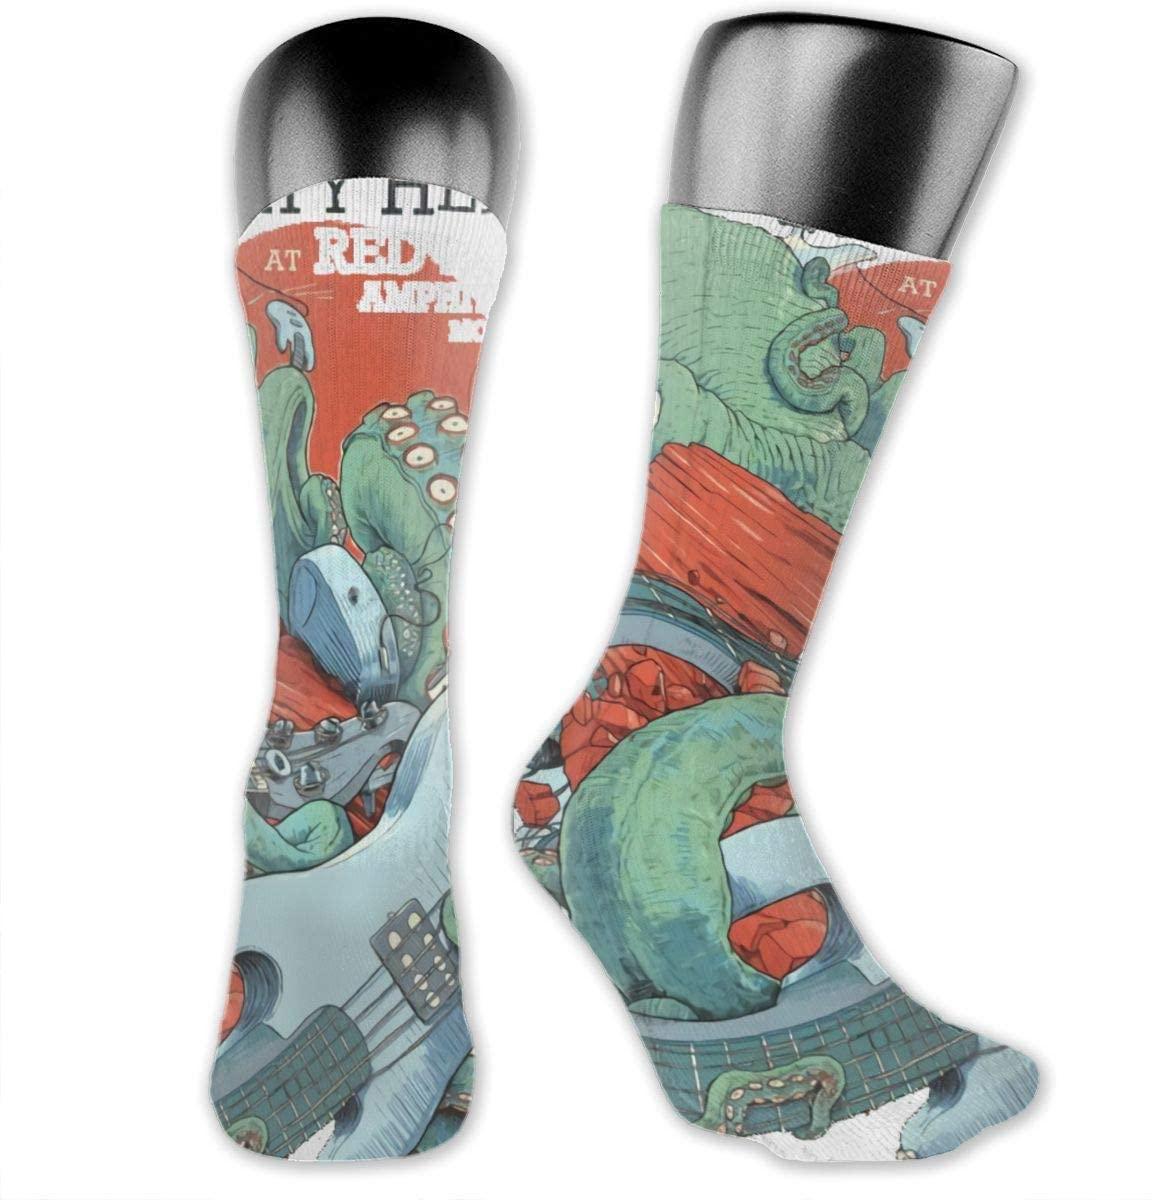 Dirty Heads Long Socks Novelty Cool Cotton Warm Winter Compression Socks for Women Men